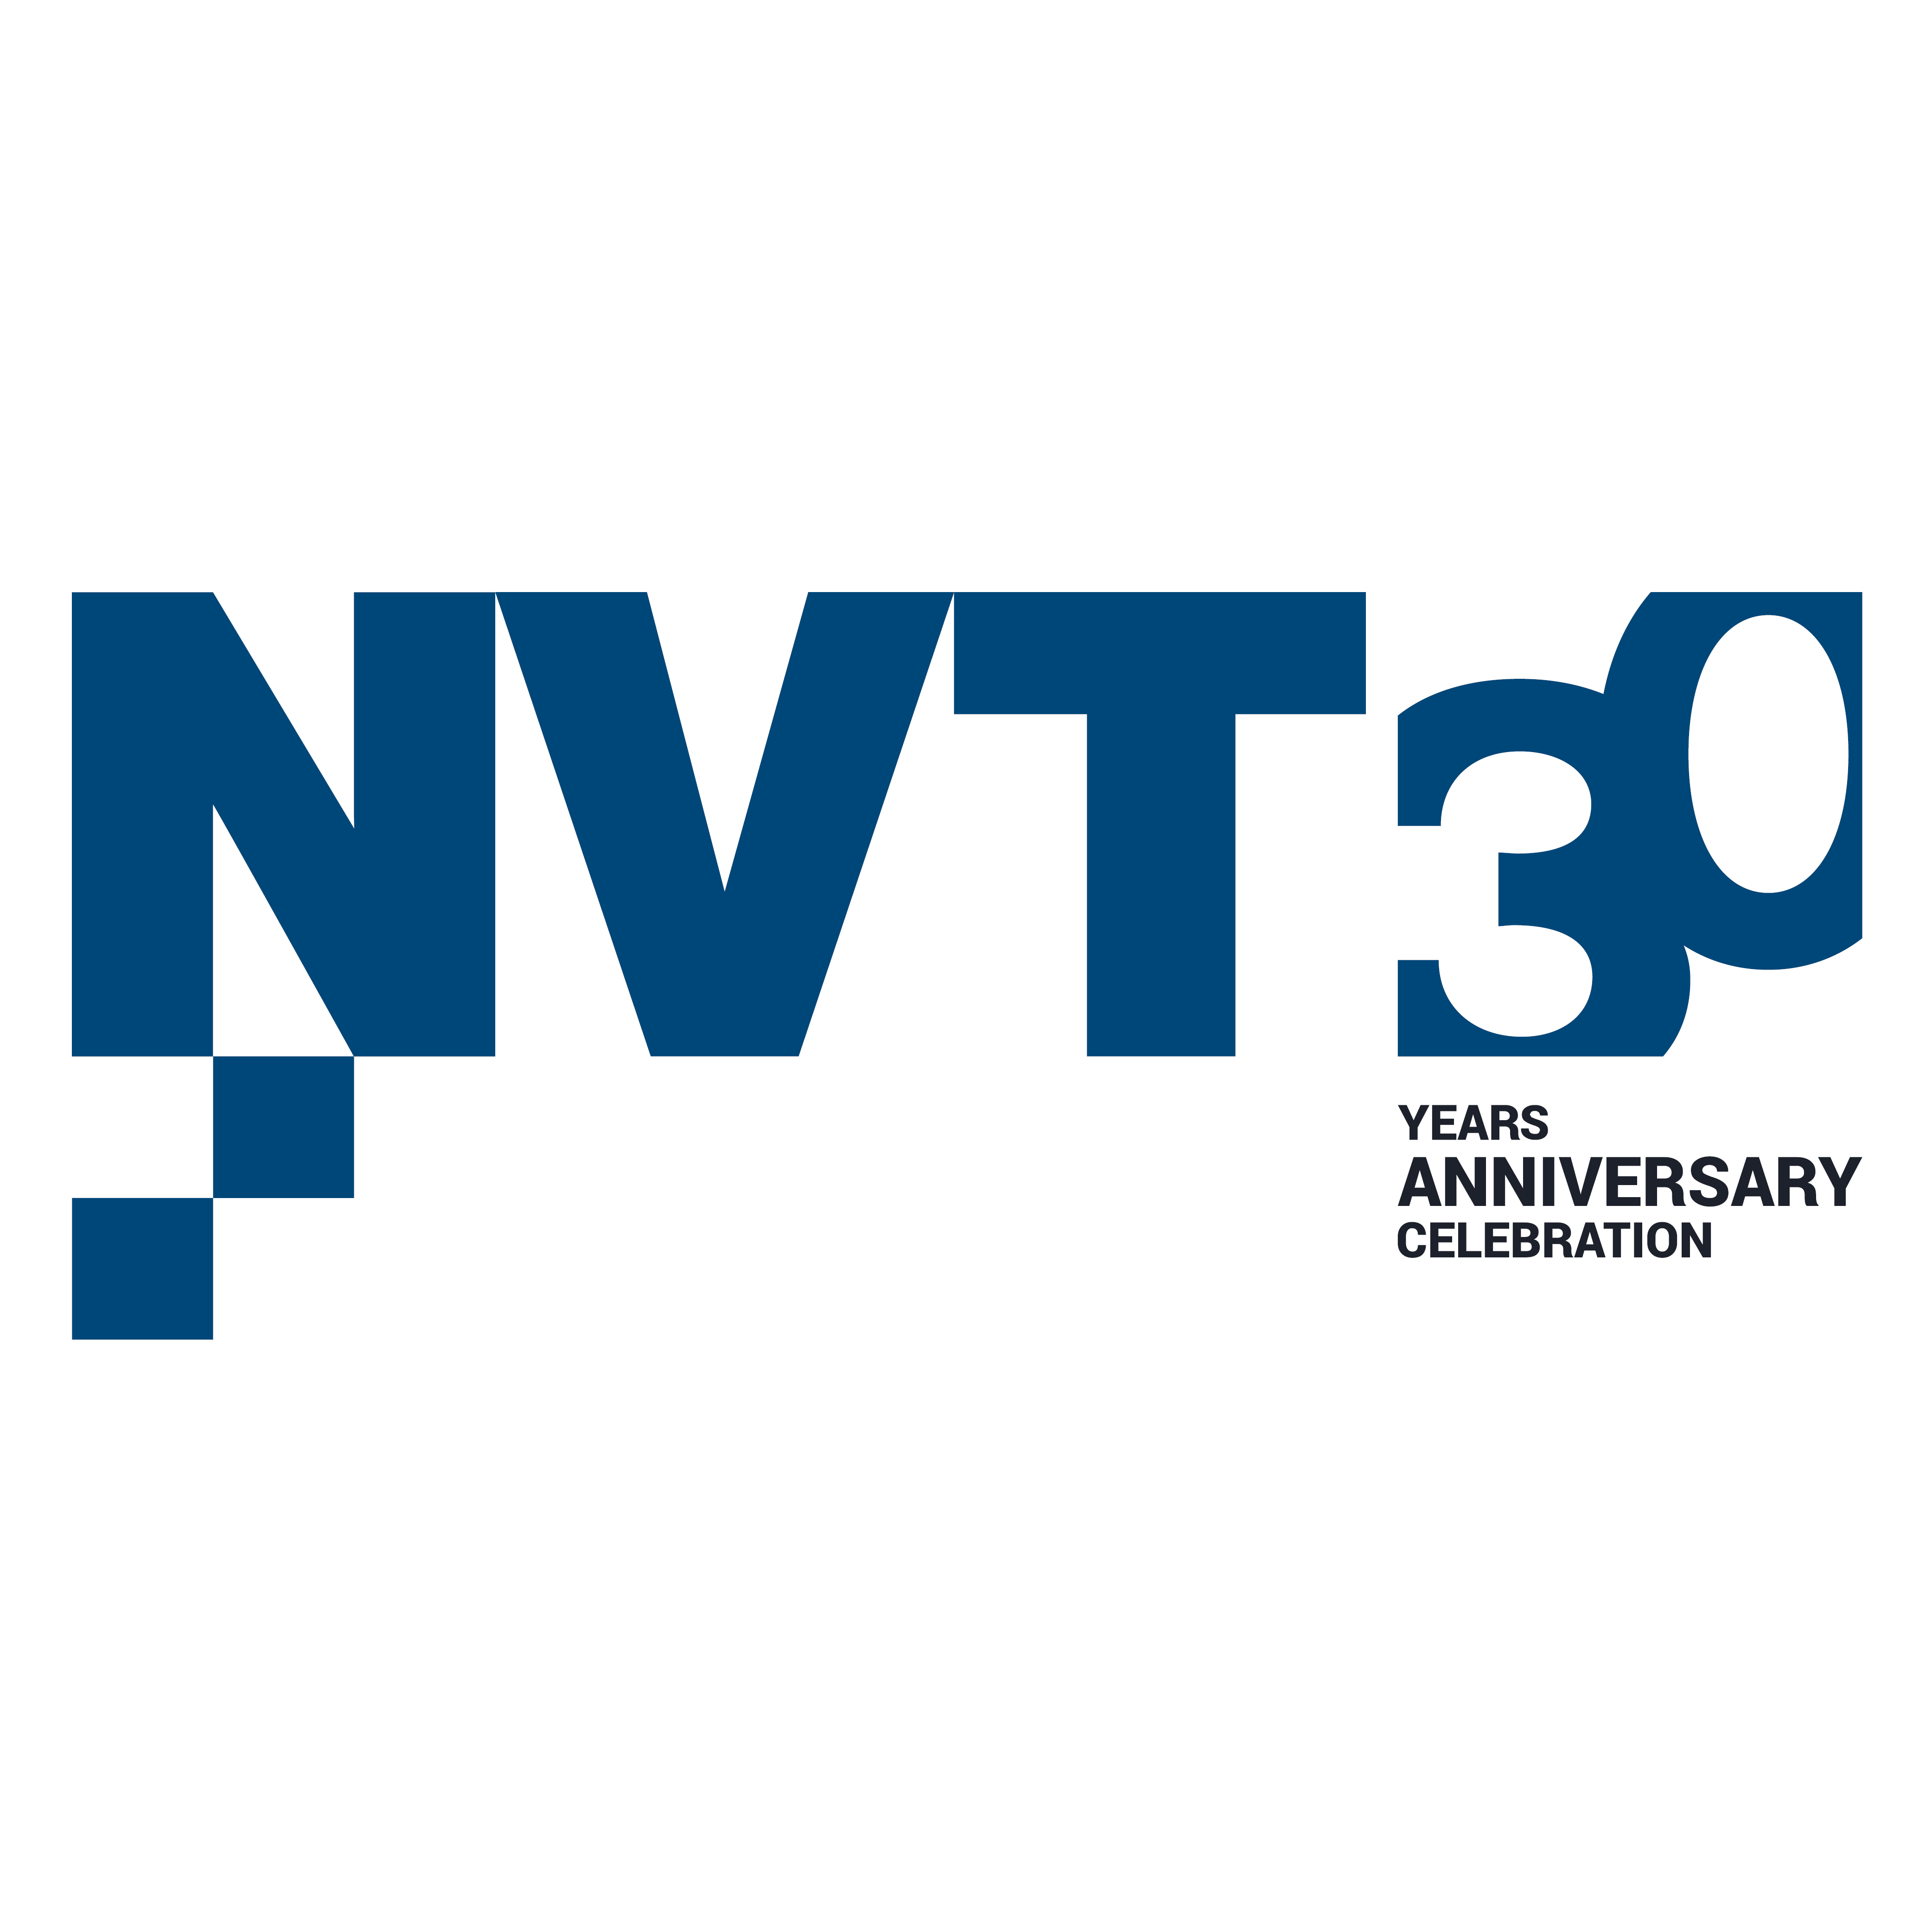 September 2018 - NVT celebrates its 30th anniversary